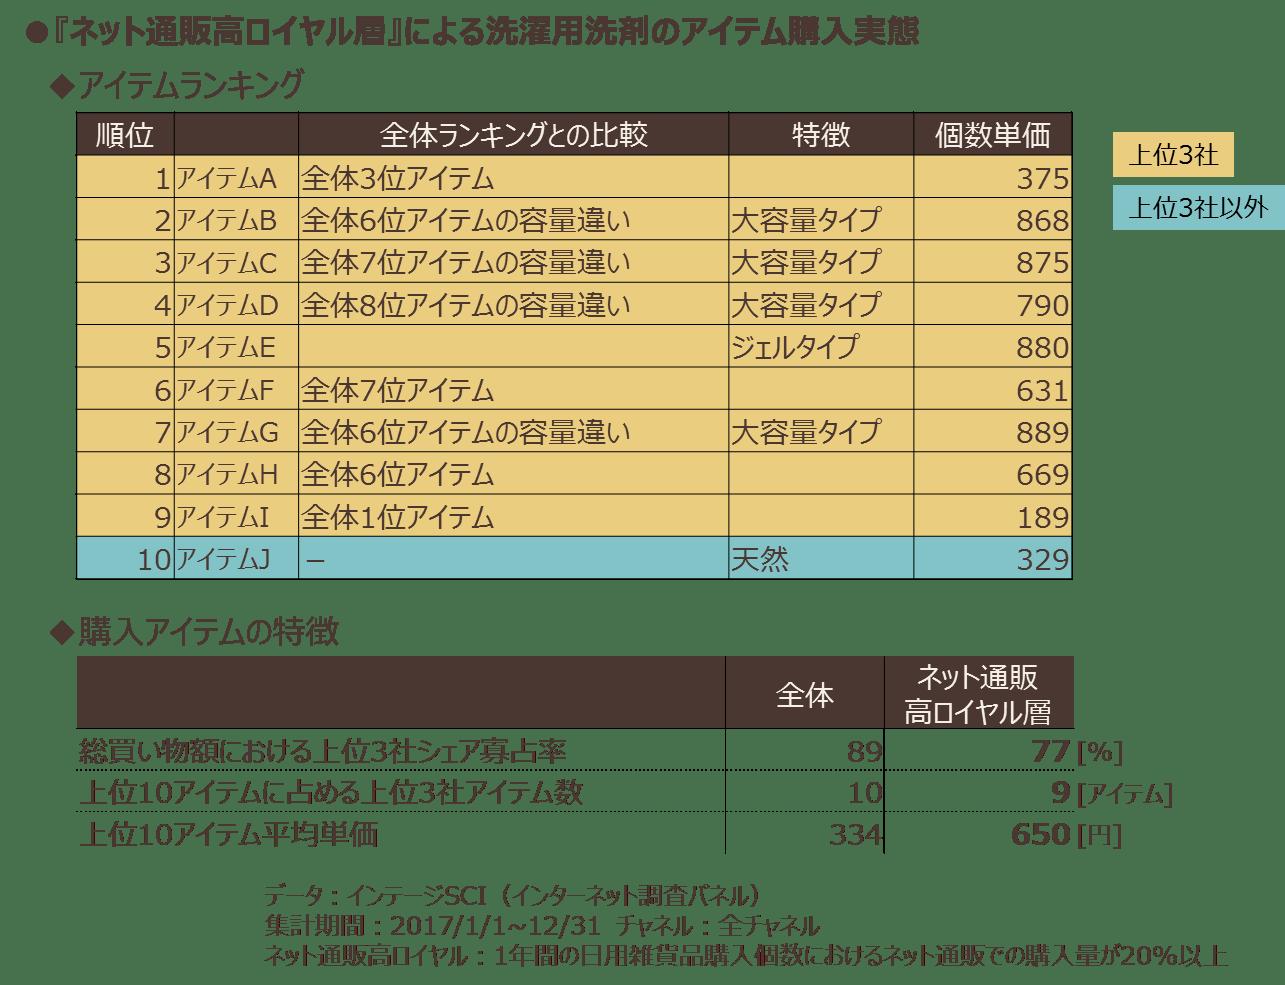 netshopping_11.png